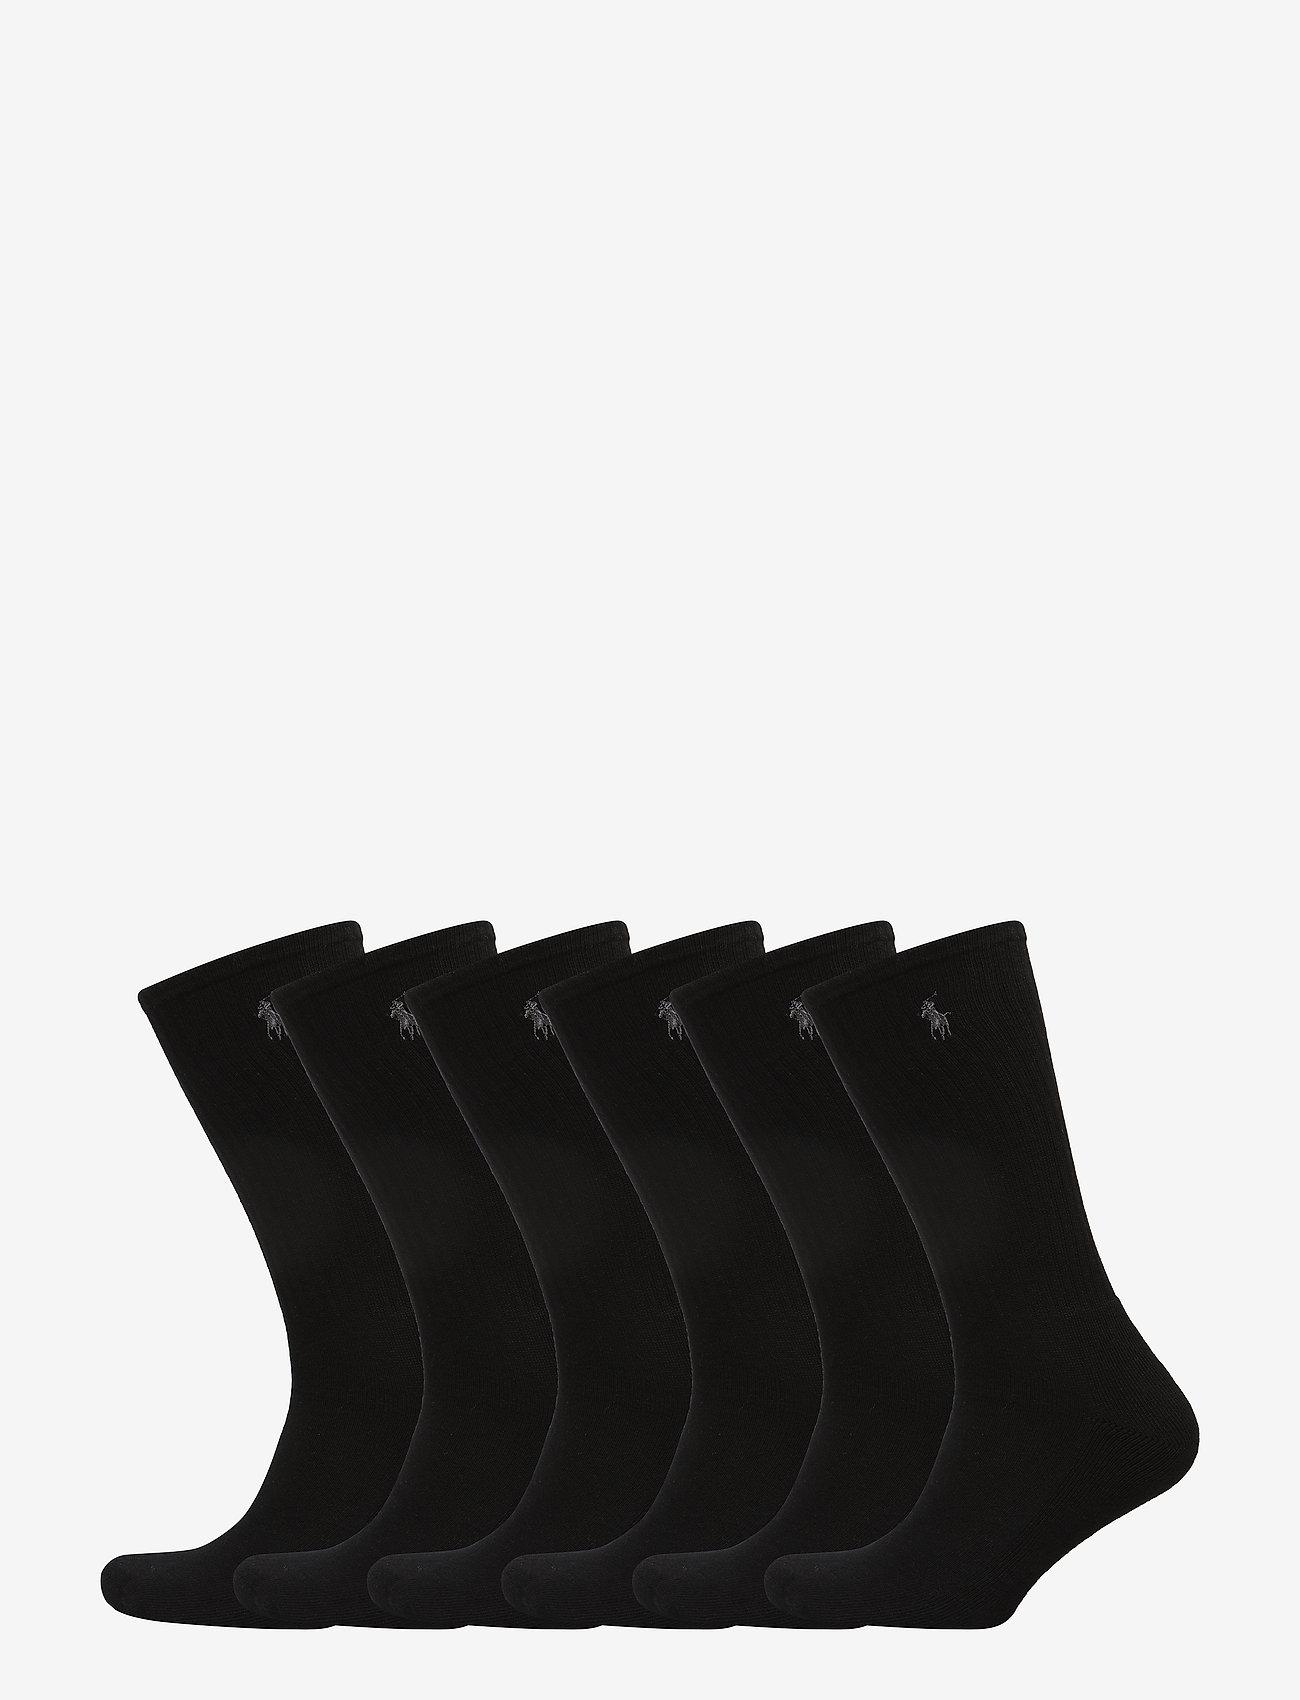 Polo Ralph Lauren Underwear - Cotton-Blend Crew Sock 6-Pack - regular socks - black - 0